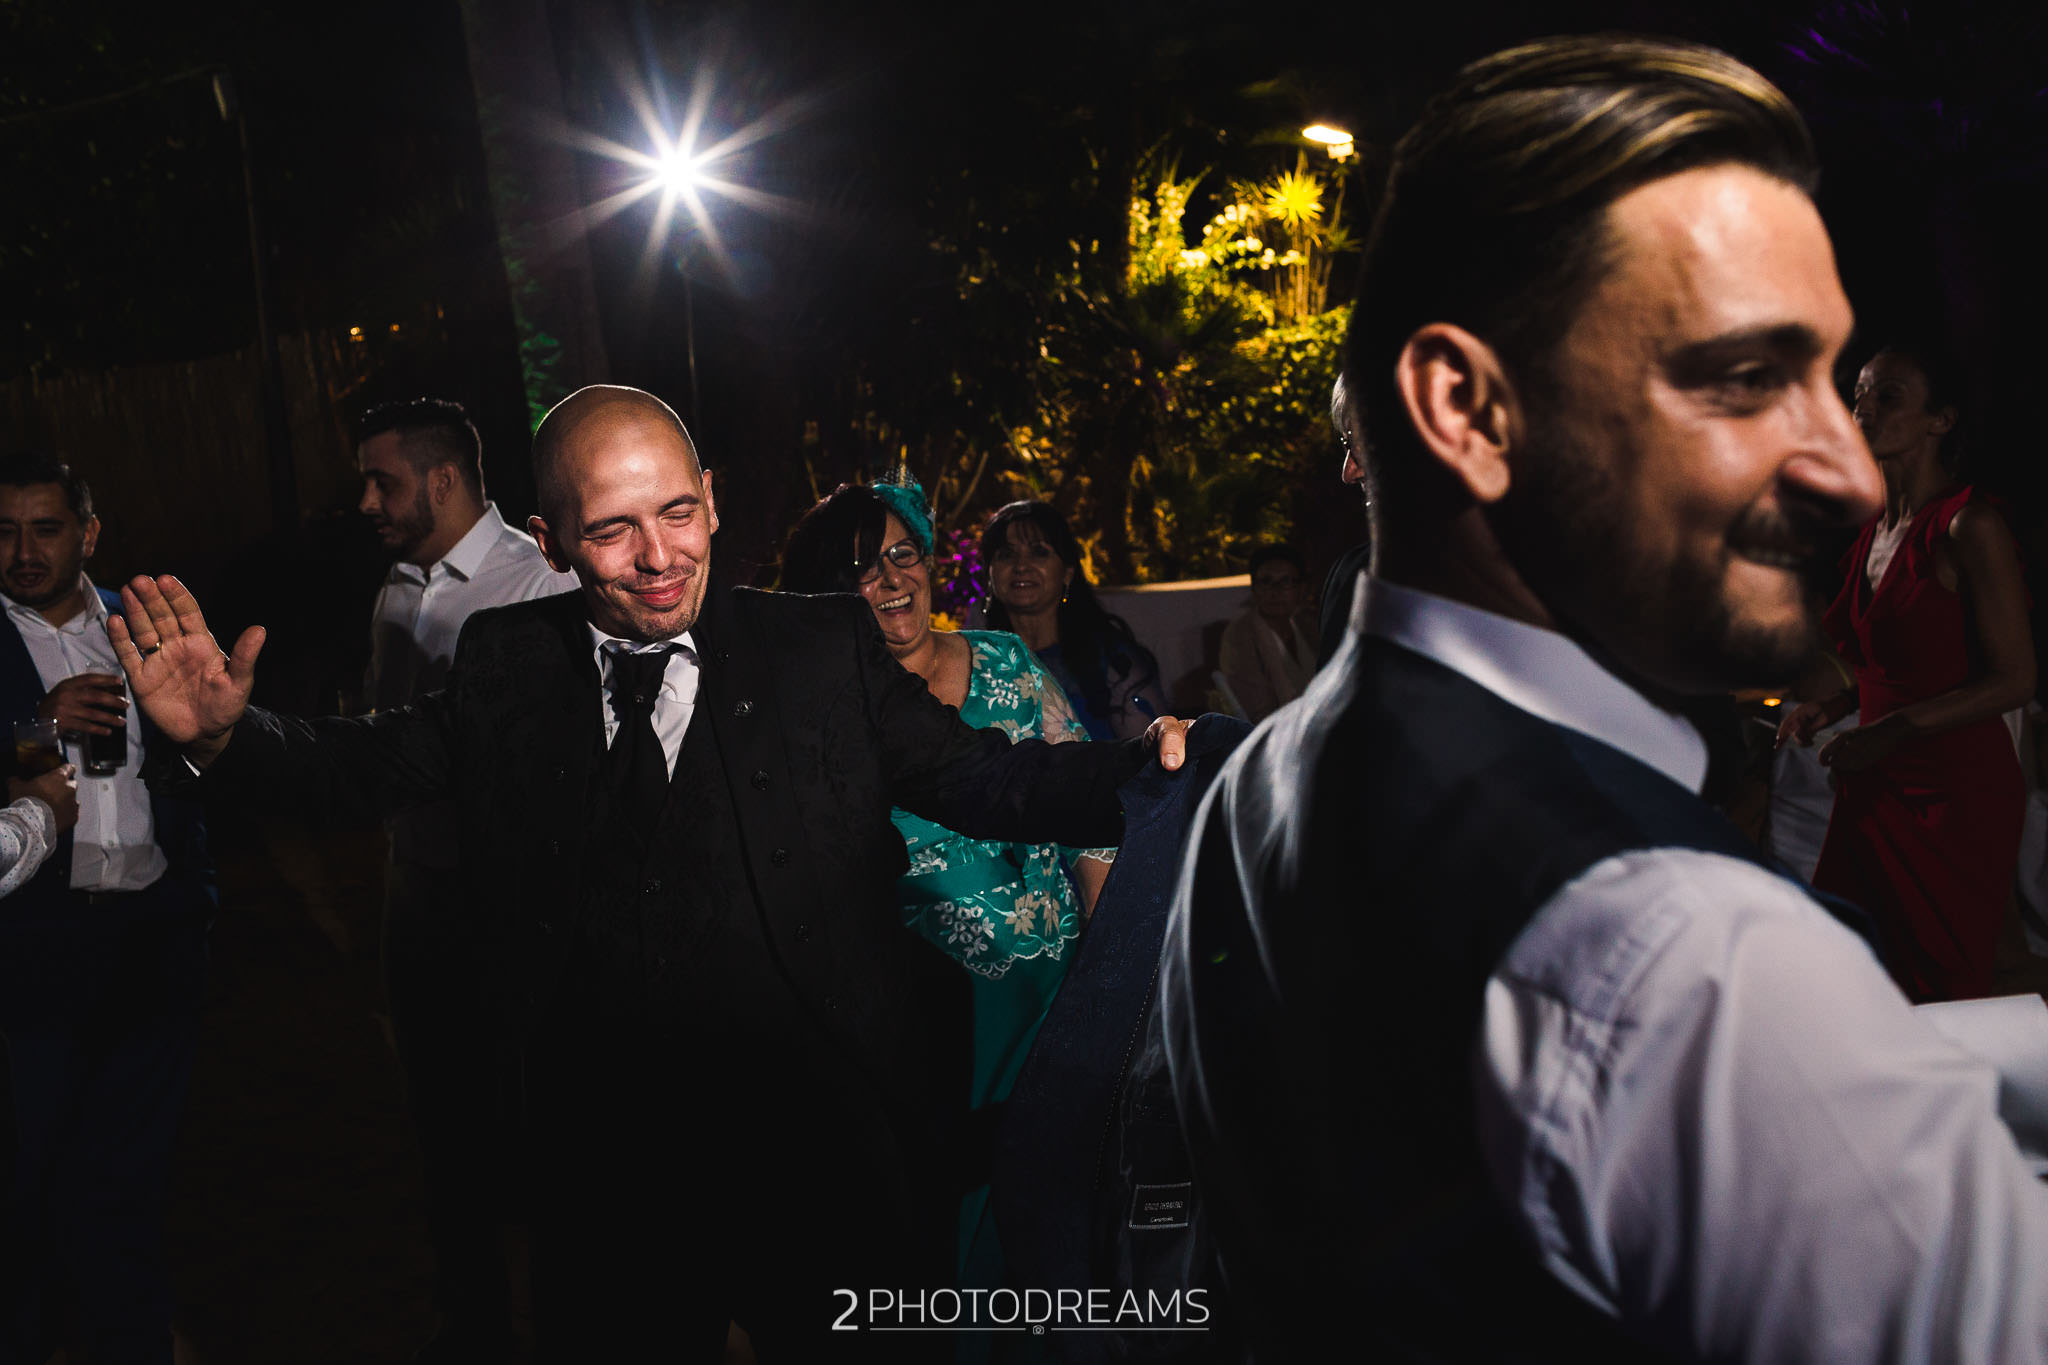 Wedding photographer Waterton Park Hotel